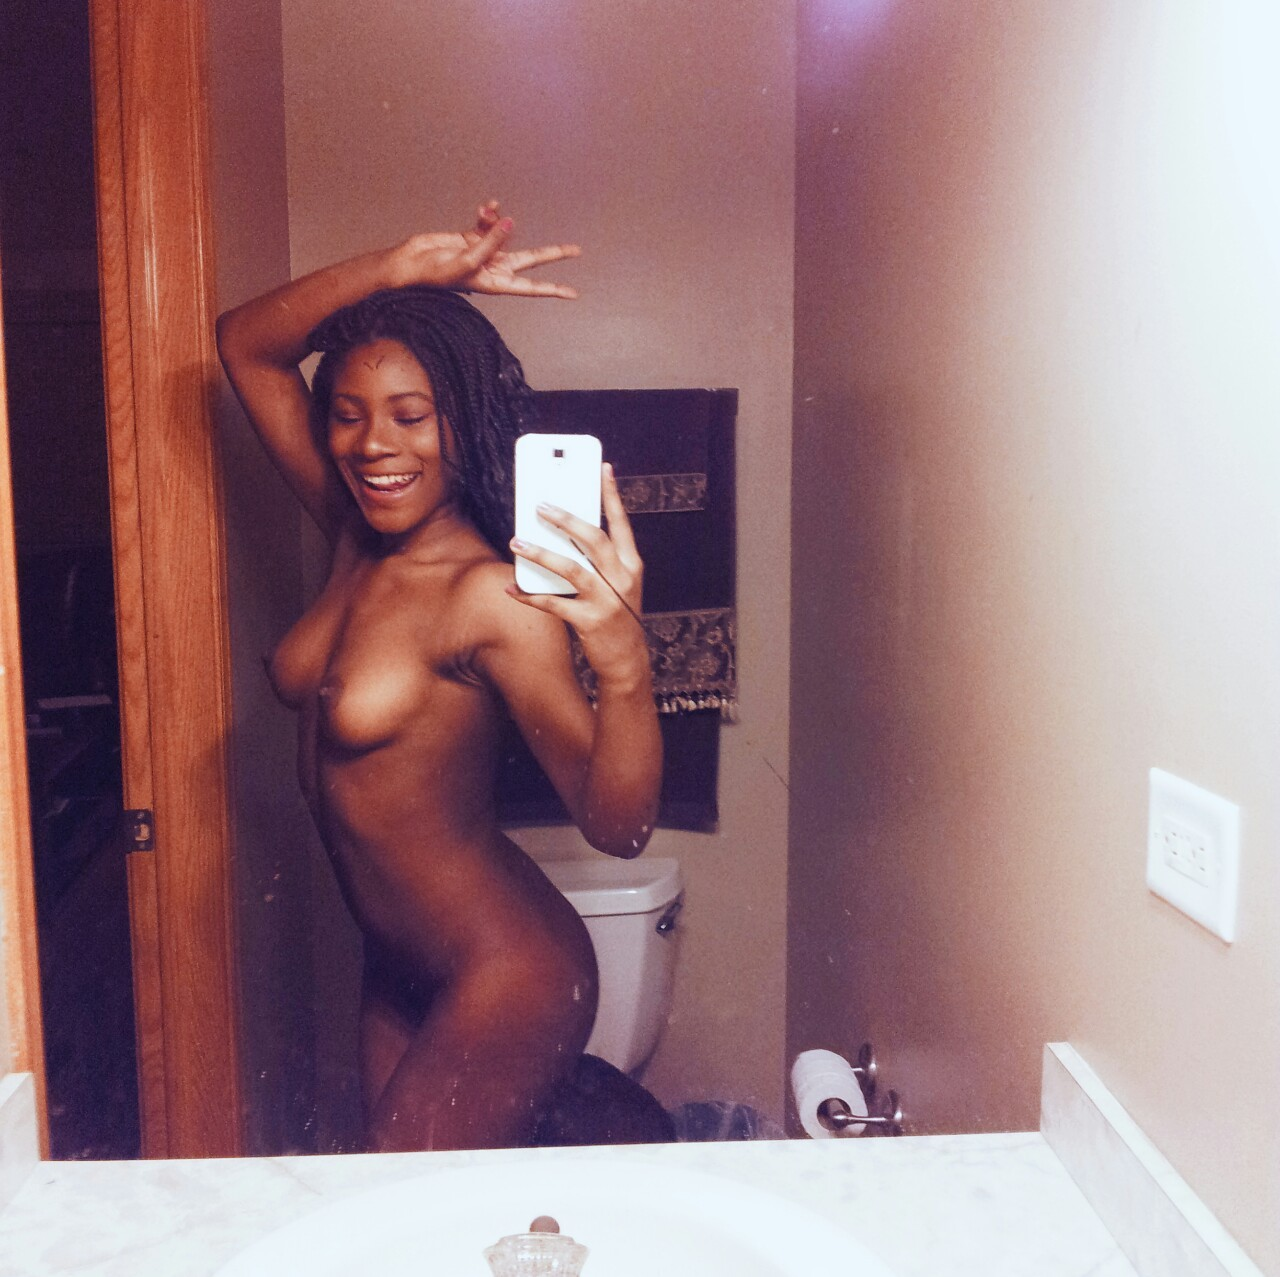 porno image de femme du 41 très sexe